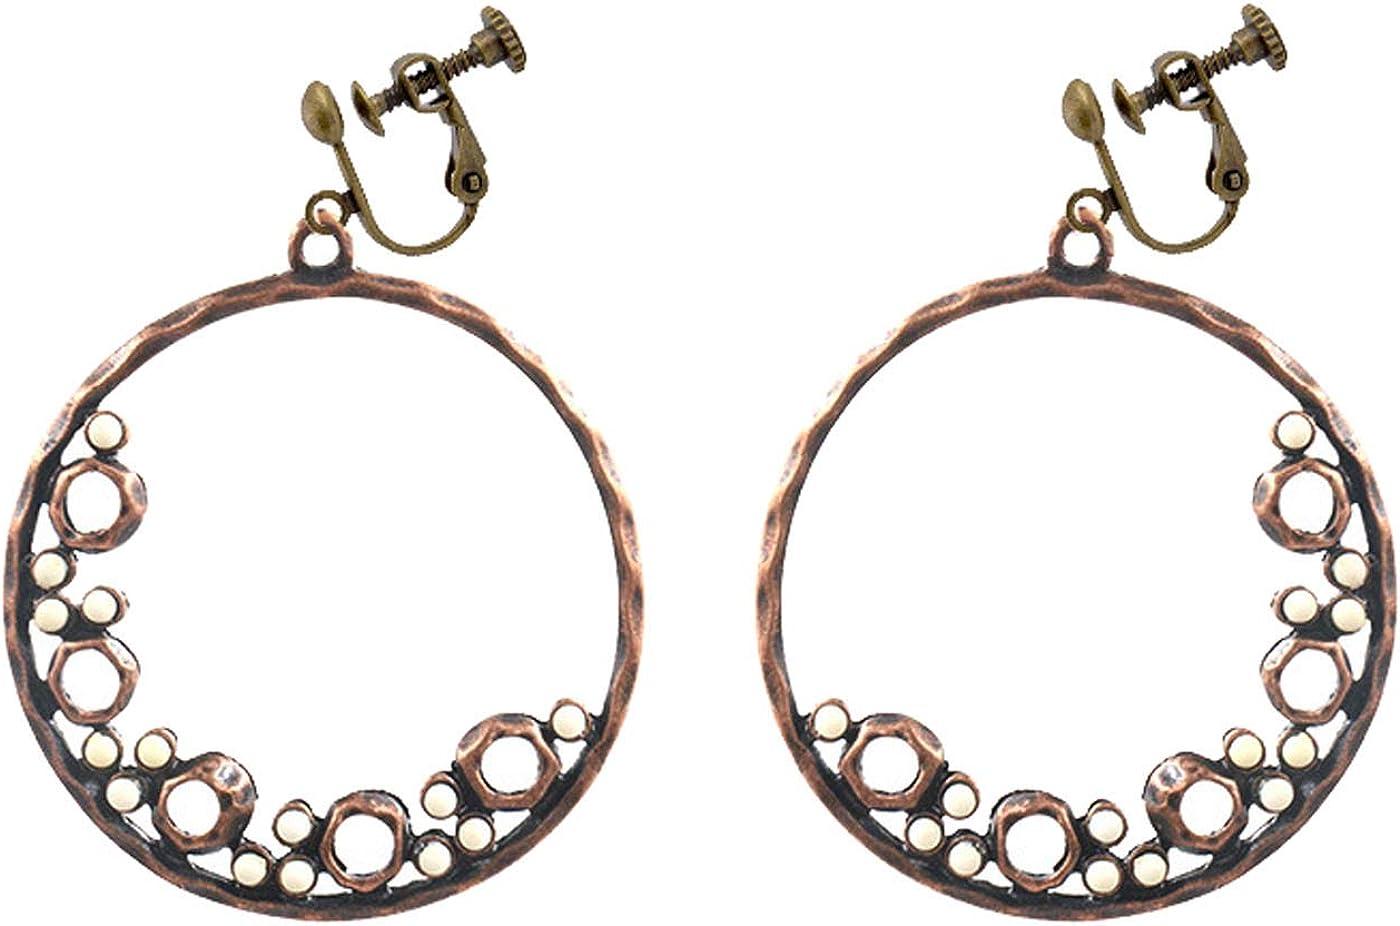 Boho Clip on Earrings for Women Girls Big Hoop Dangle Colorful Beaded Drop for Non Pierced Bohemian Vintage Style